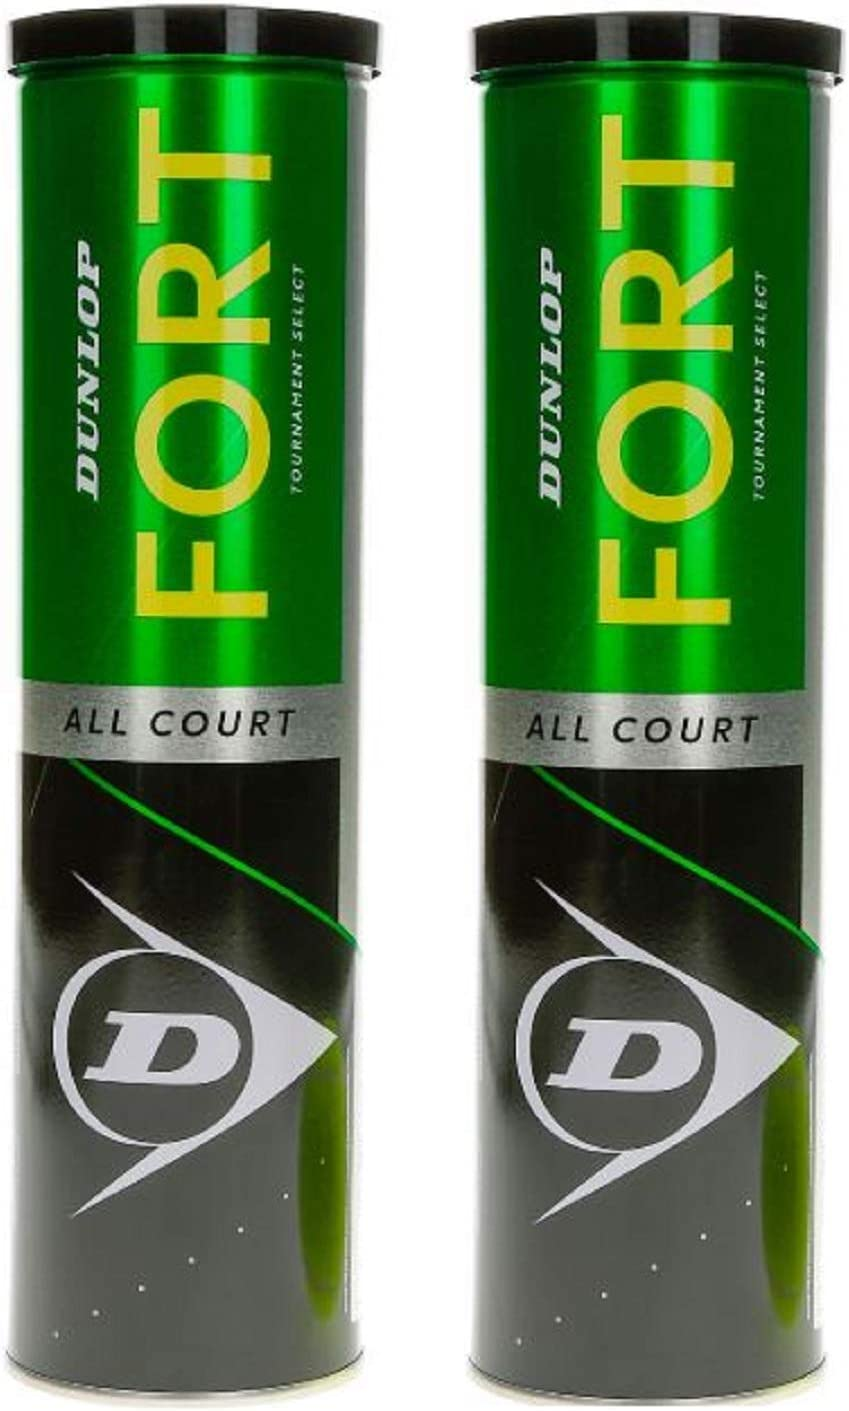 Dunlop 601357 Pelota de Tenis, Fort All Court TS - Pack de 2 Botes Metálico 2 x 4, Multicolor, Talla única